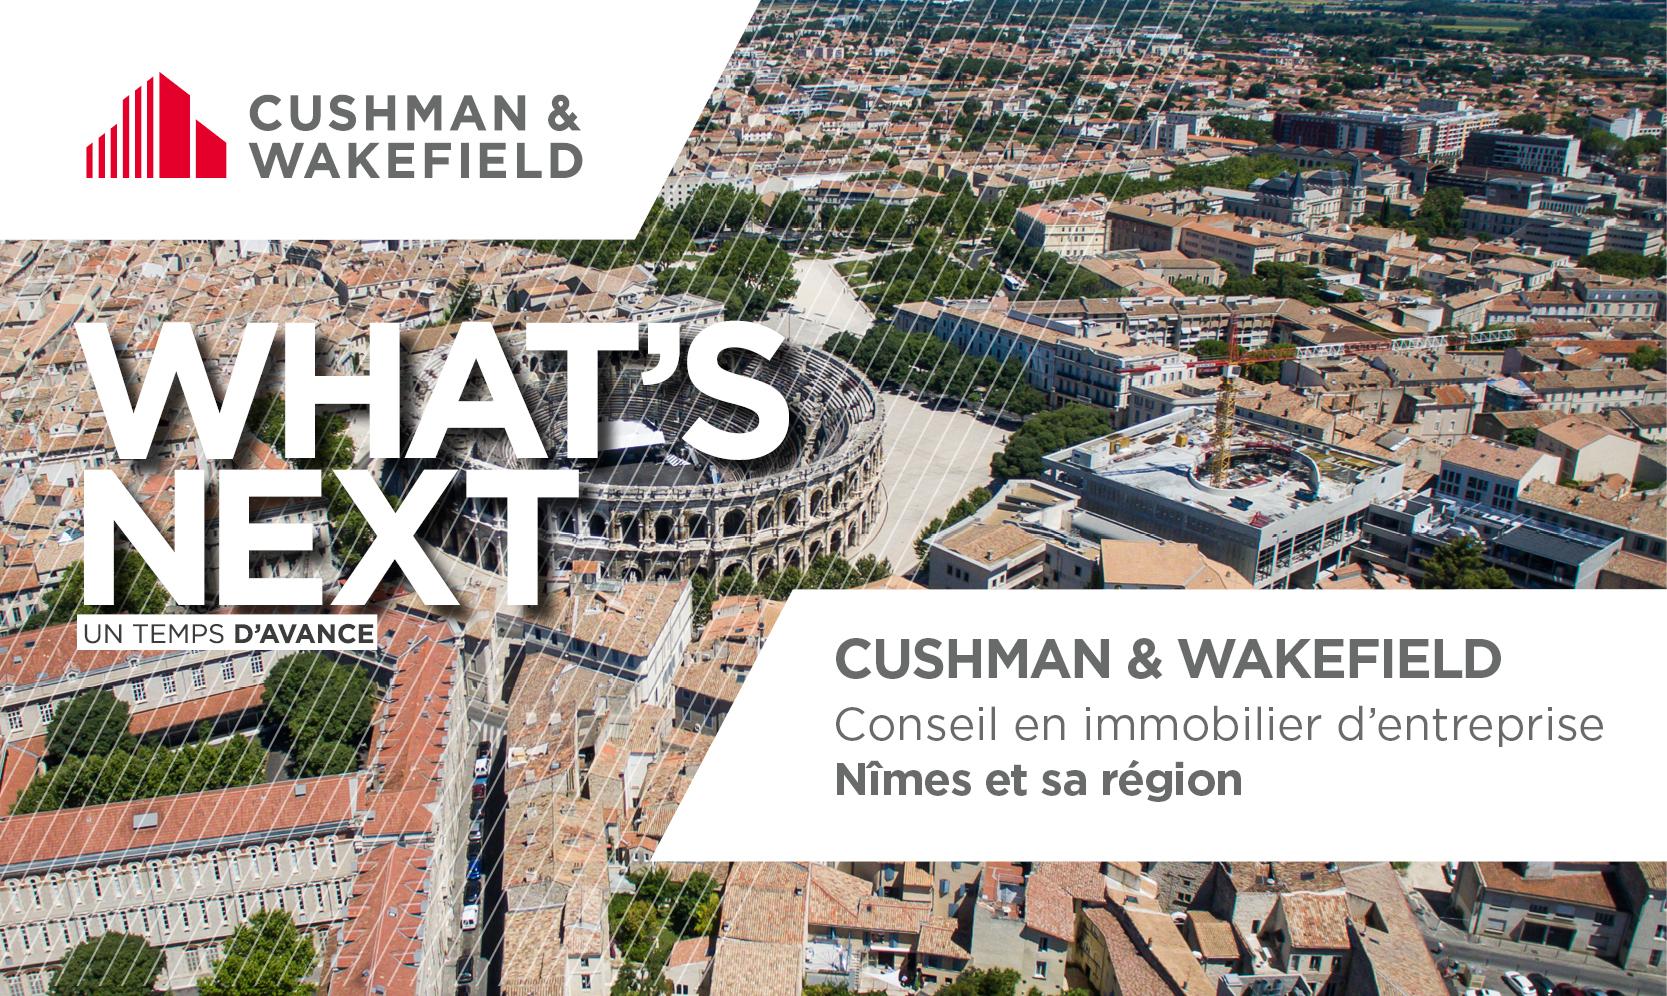 CUSHMAN & WAKEFIELD NIMES - Image